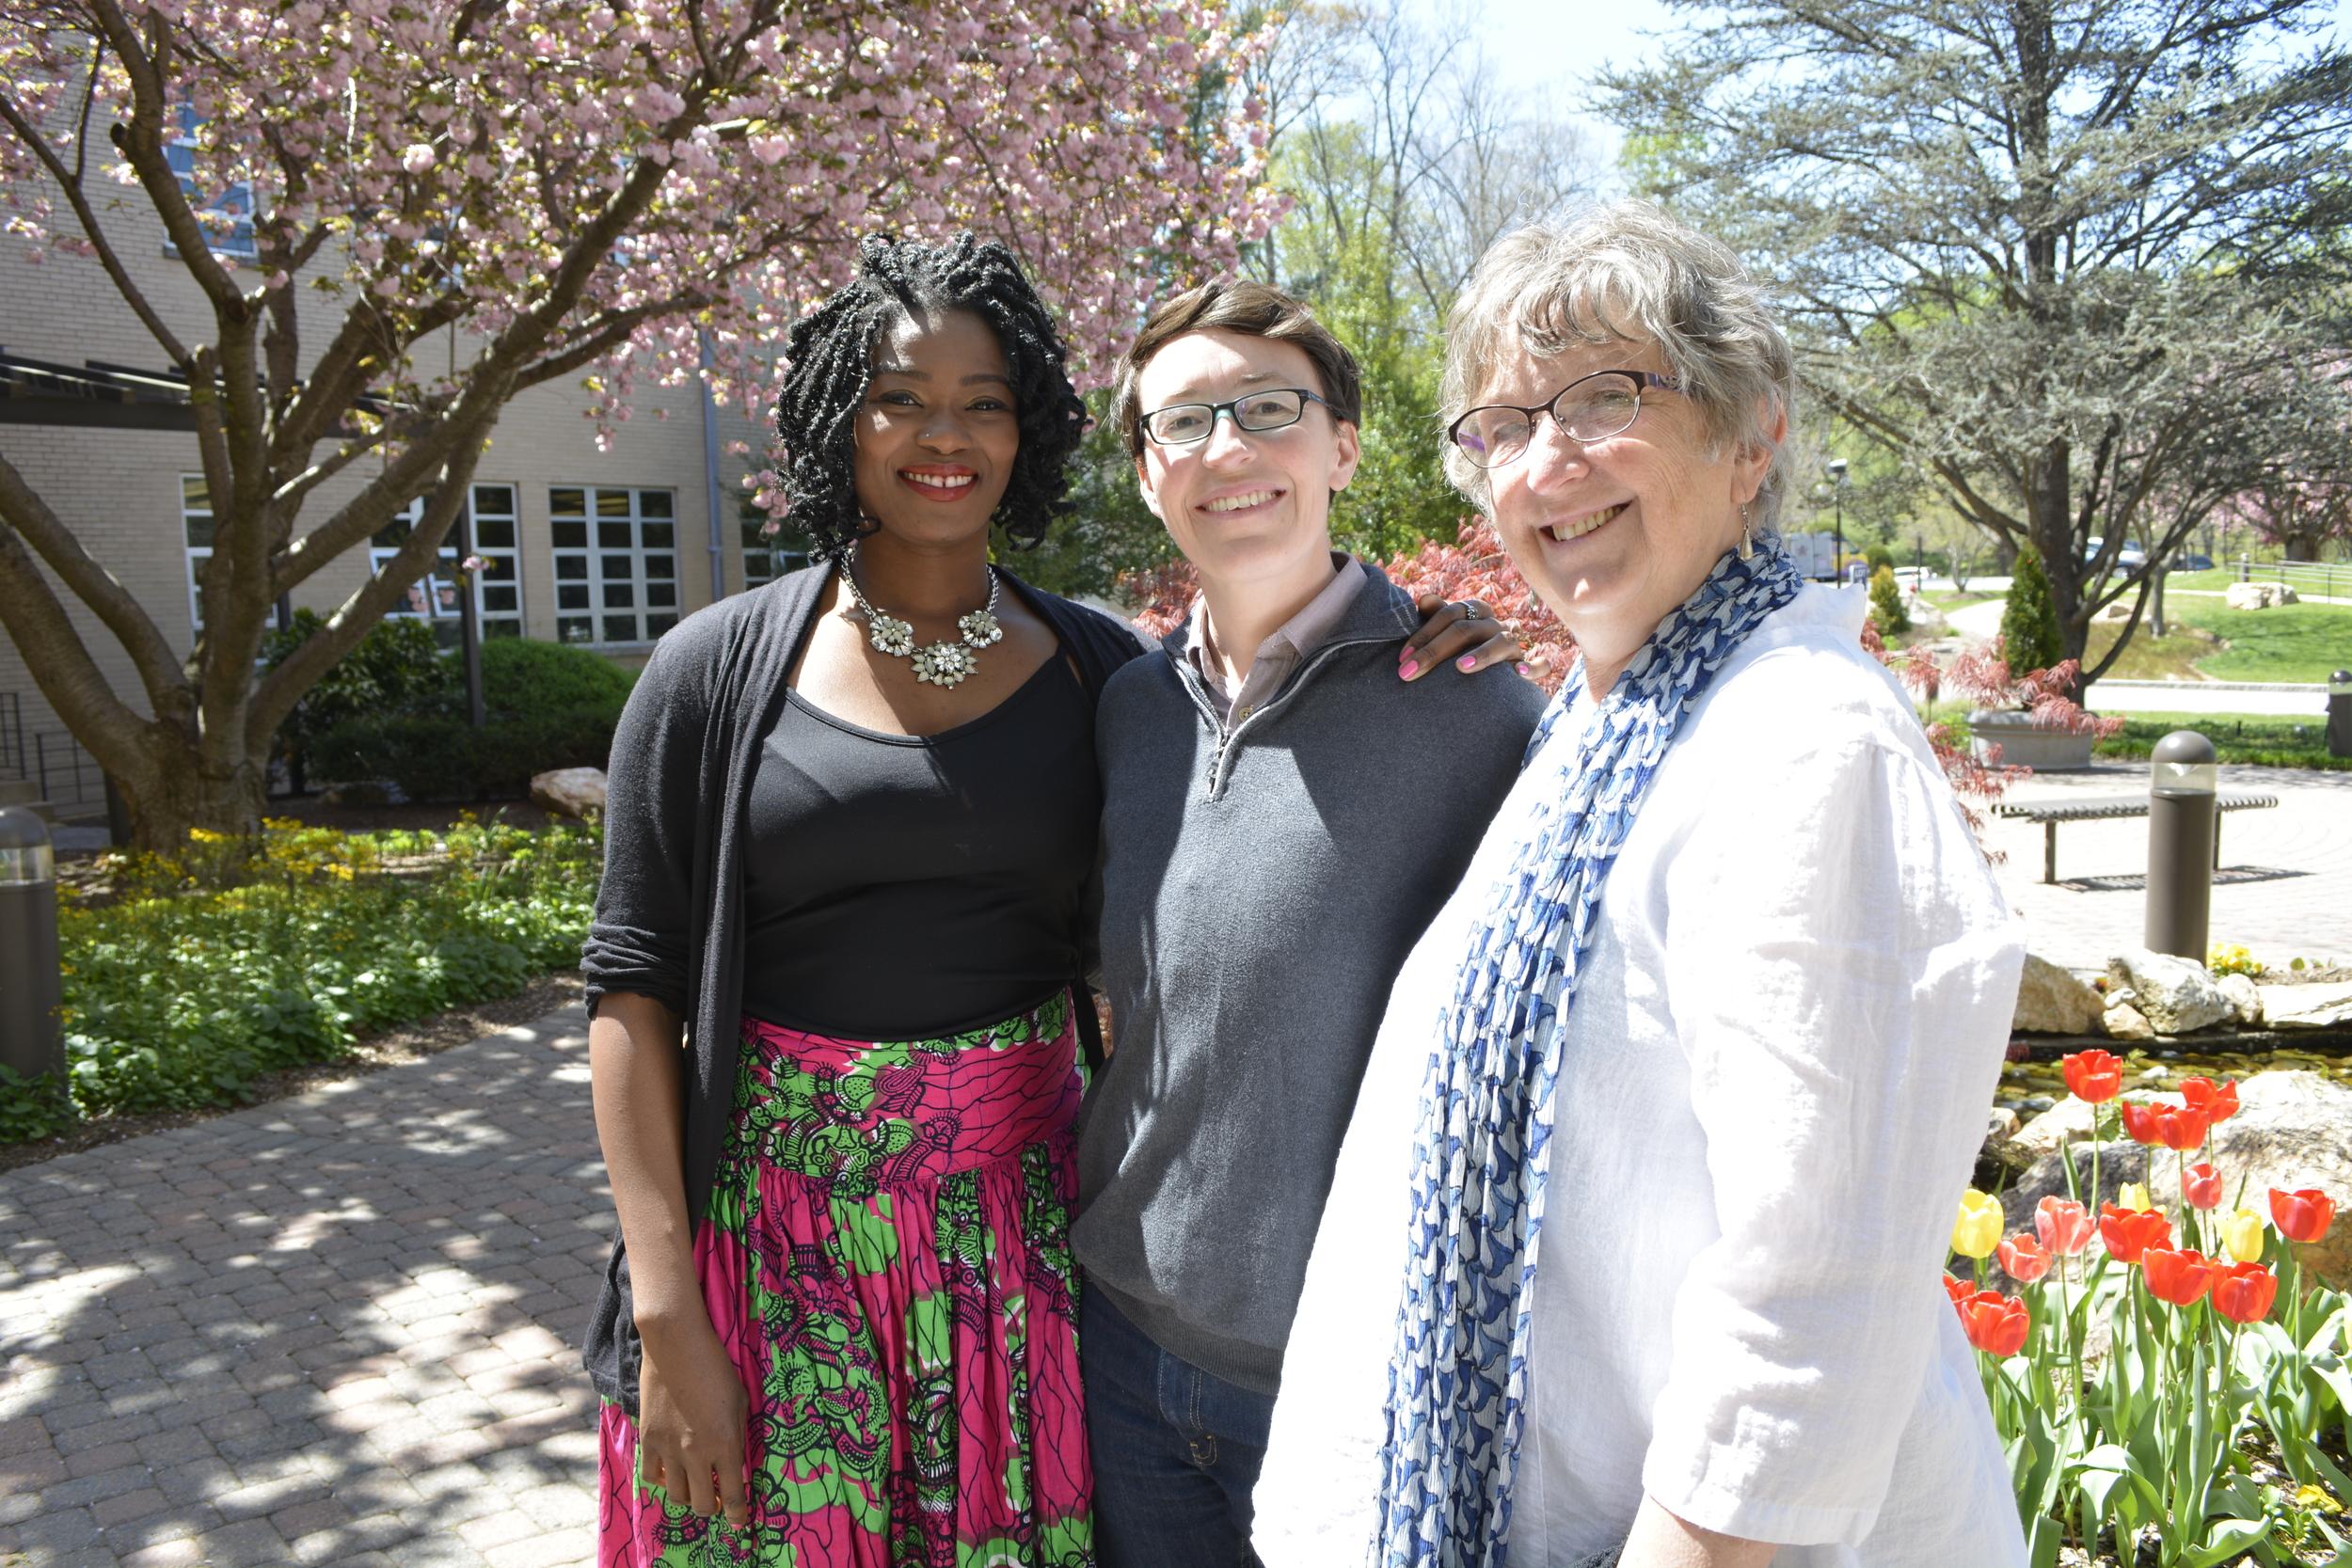 Members of the US MERA Access & Equity Taskforce